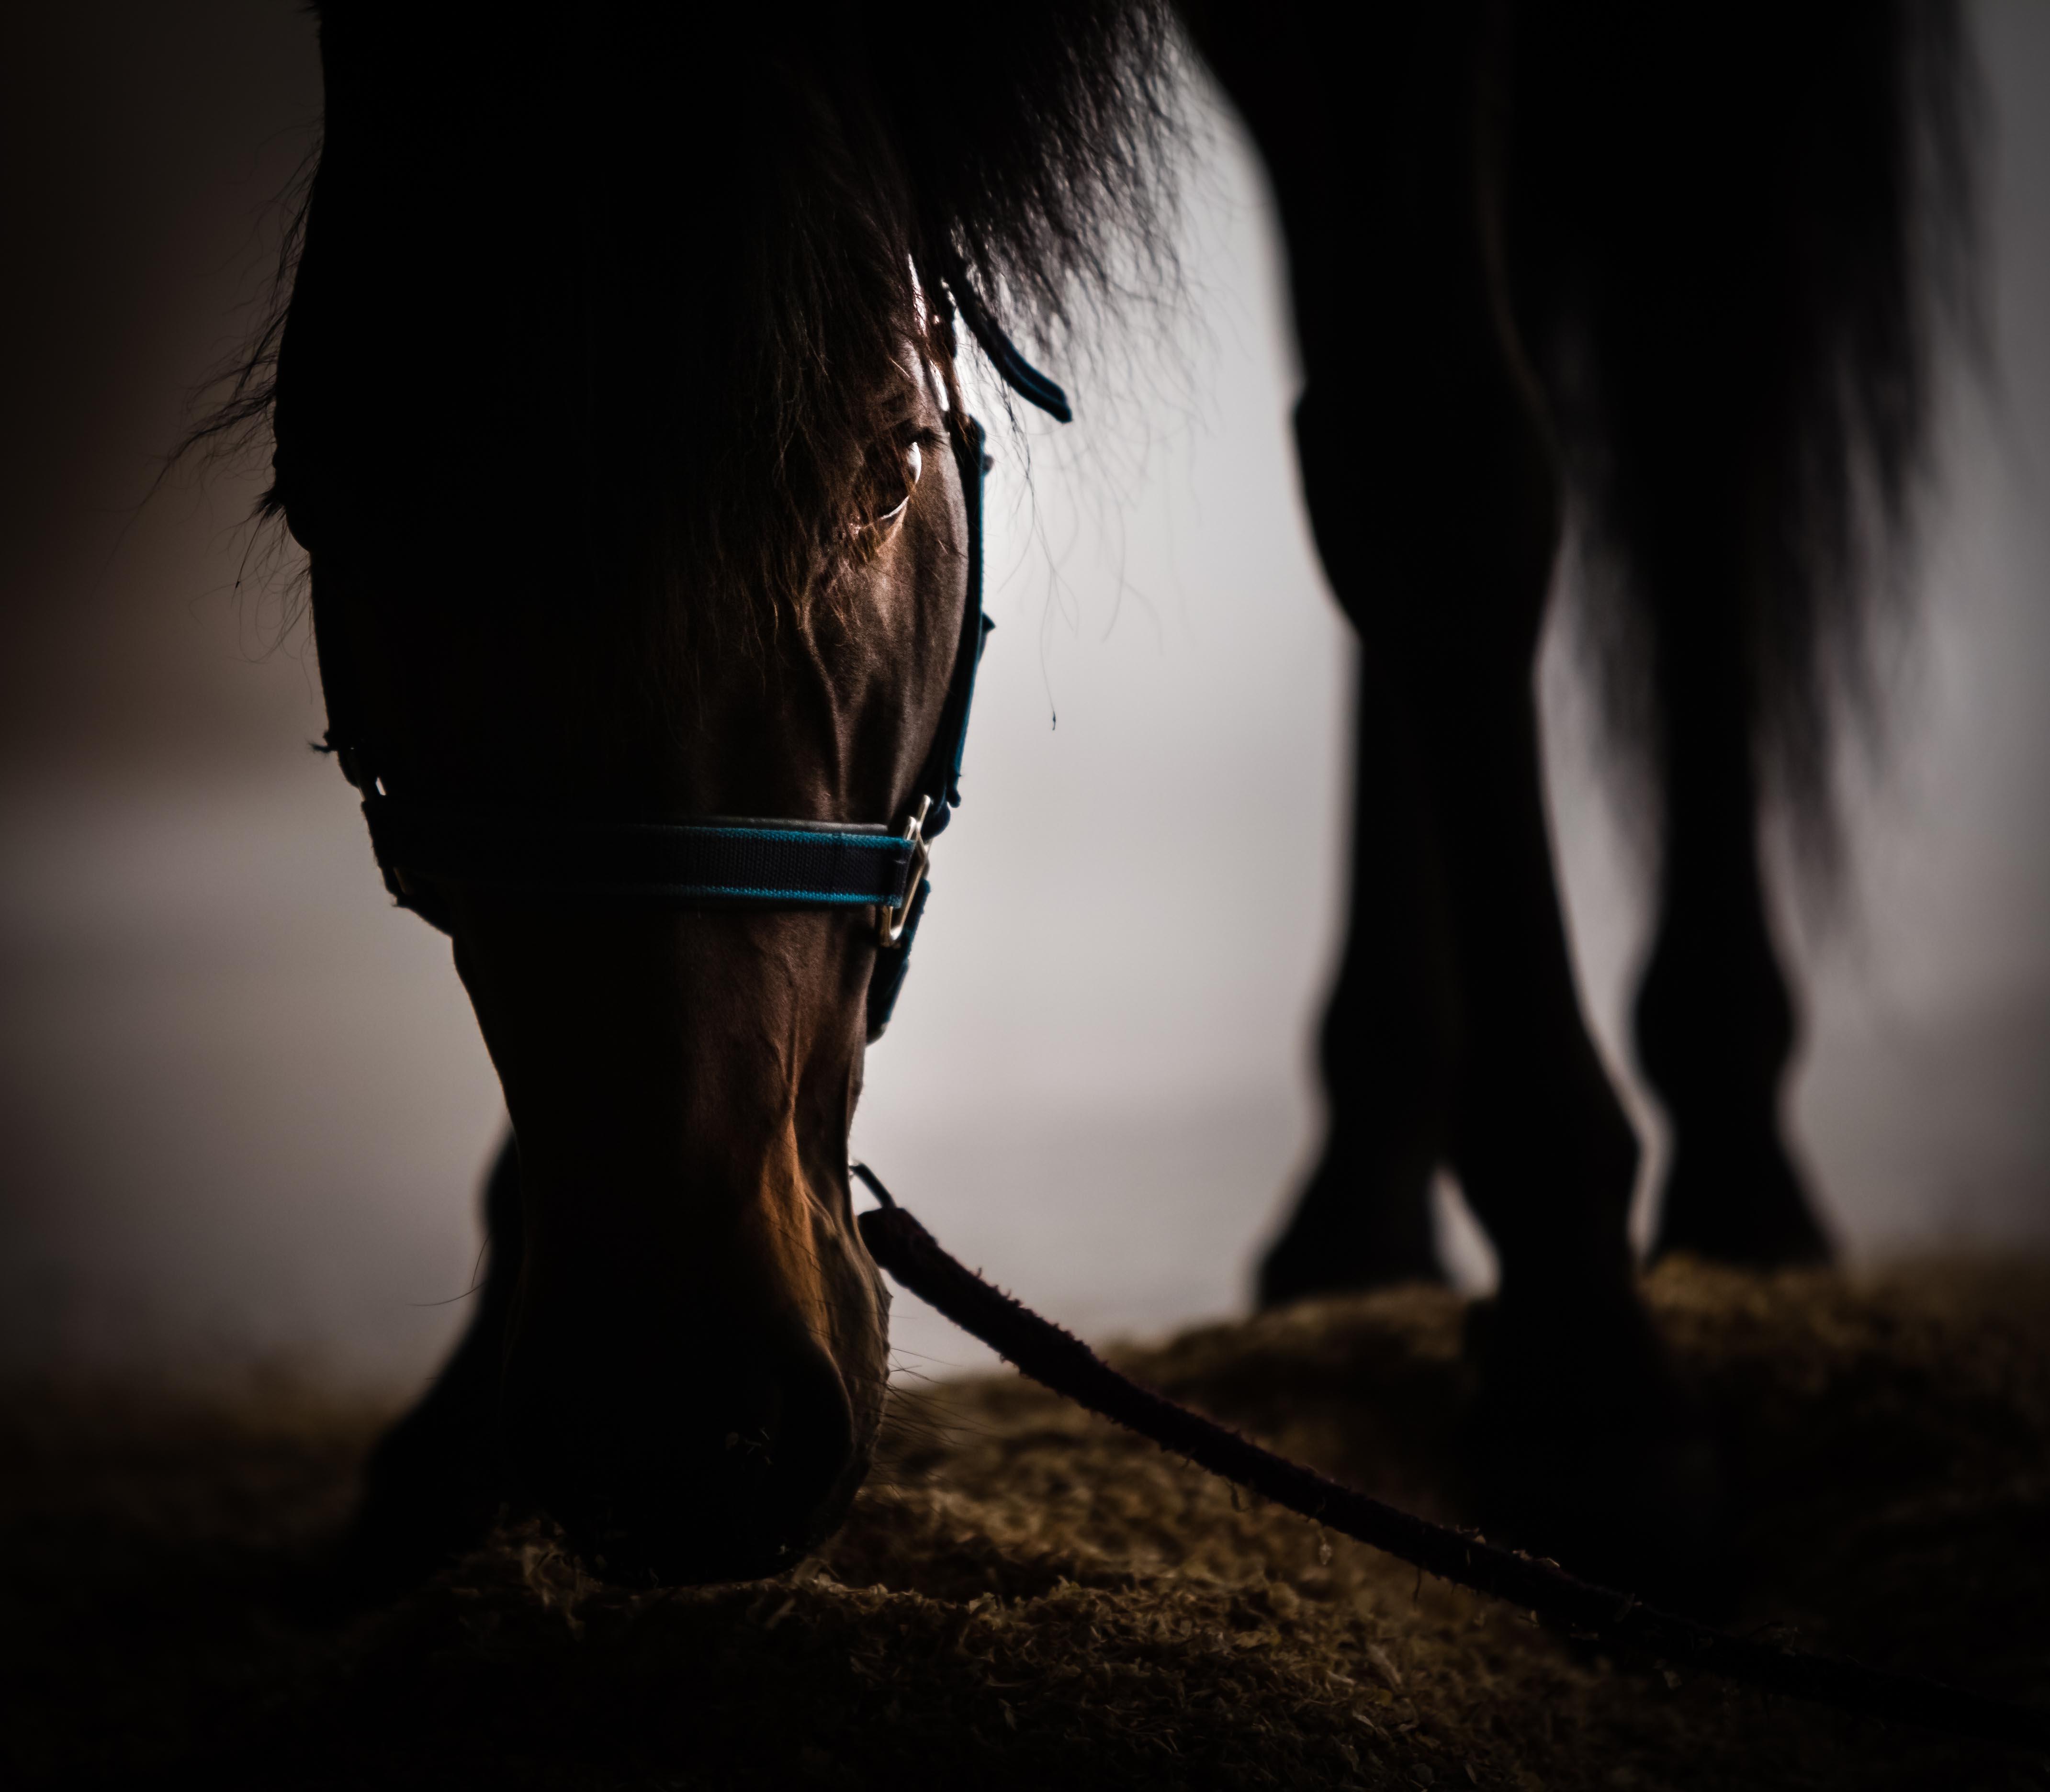 The Dark Horse 2